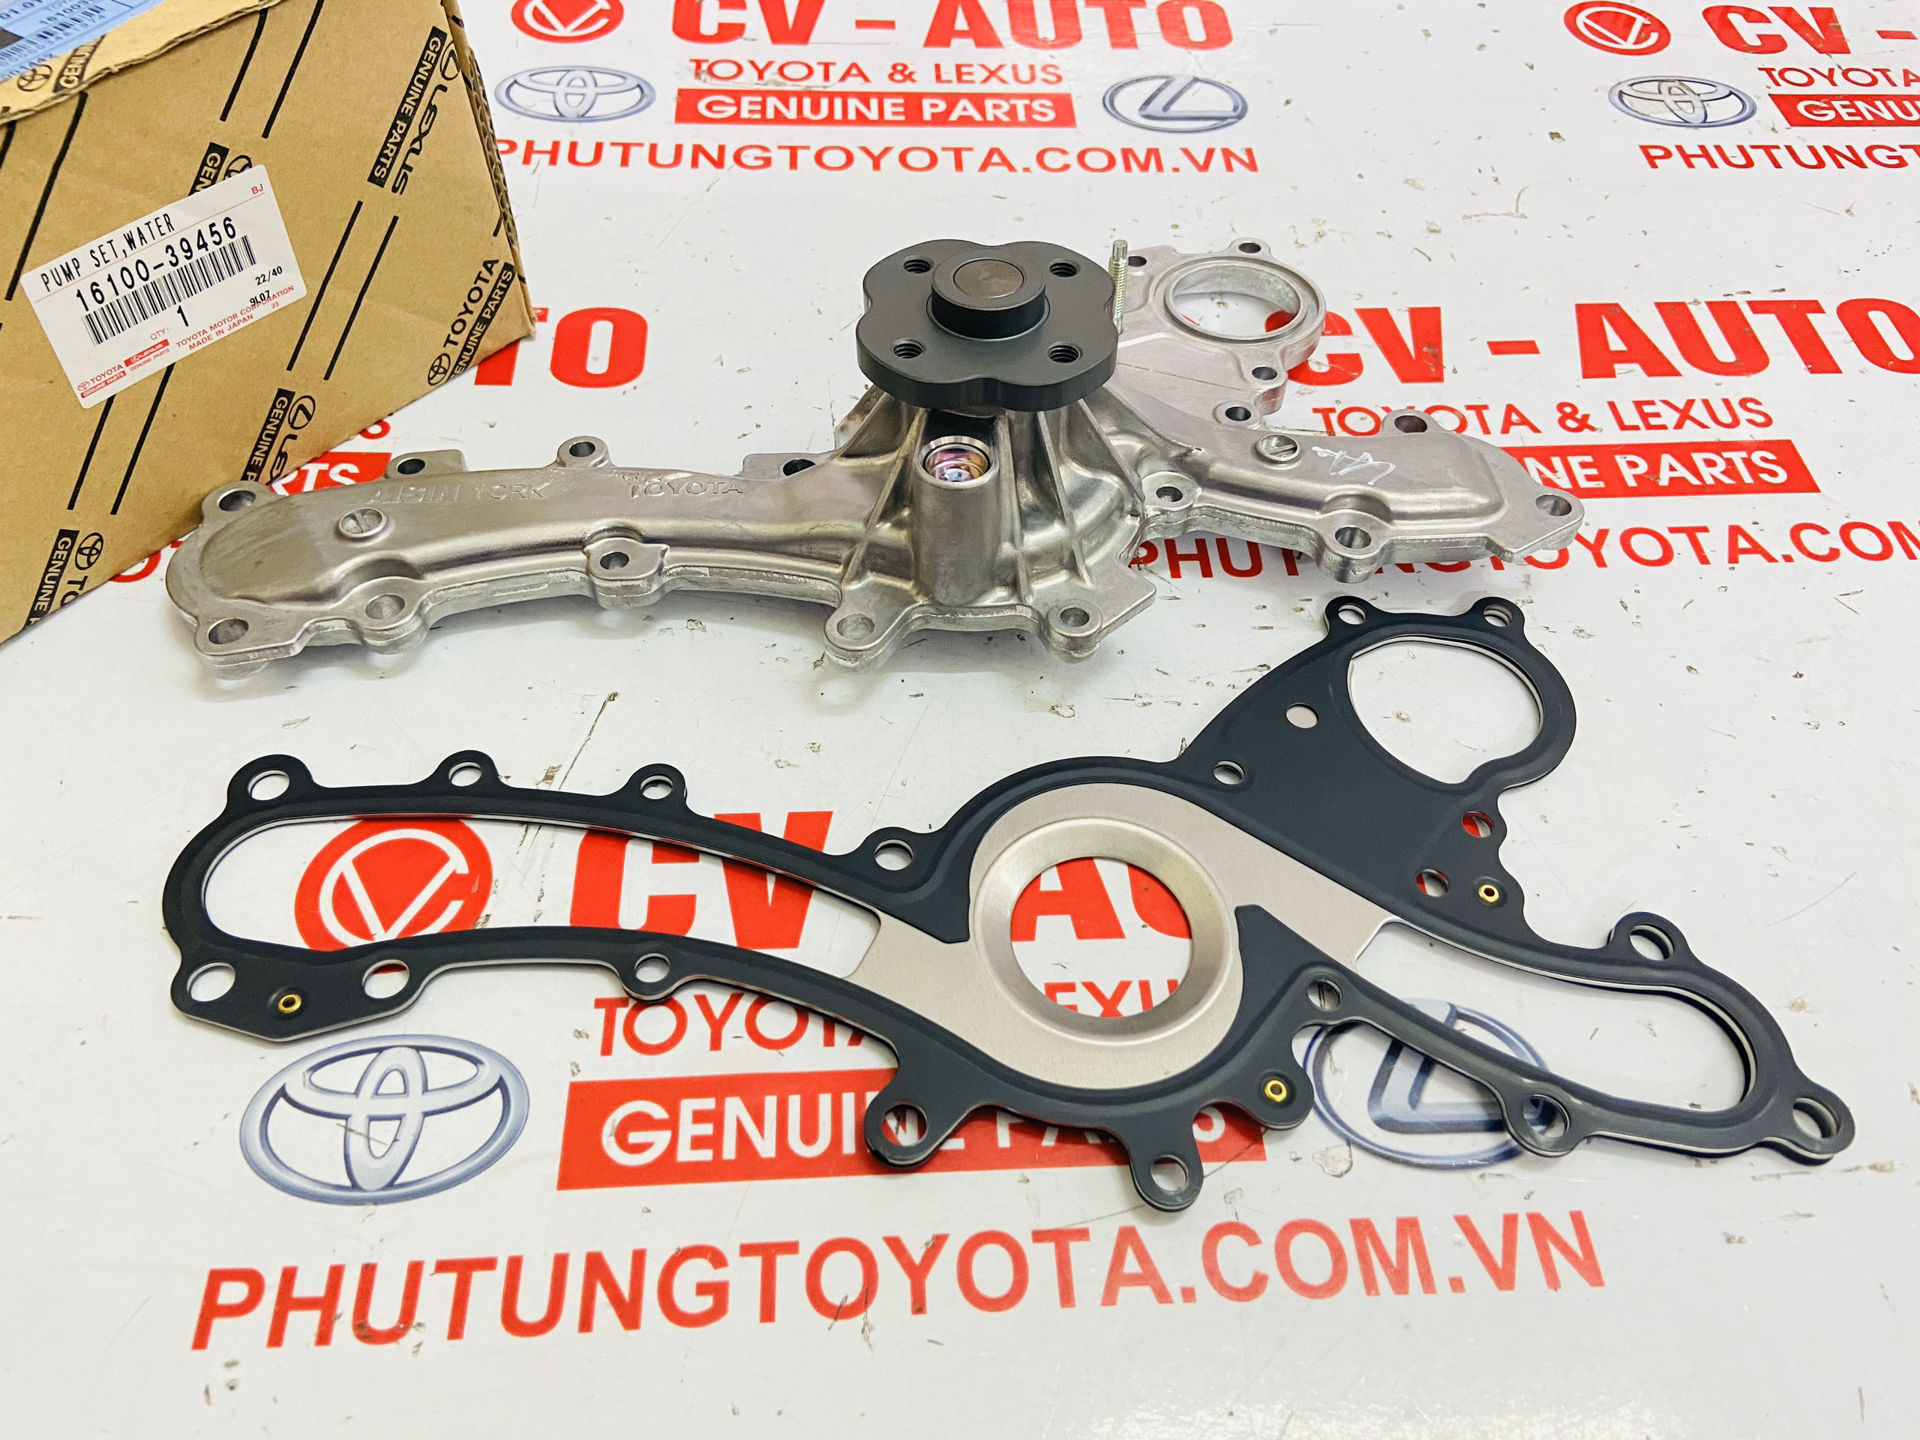 Picture of 16100-39456, 1610039456 Bơm nước Lexus RX350 EX350 - Toyota Venza Sienna Highlander Camry RAV4 máy 2GRFE